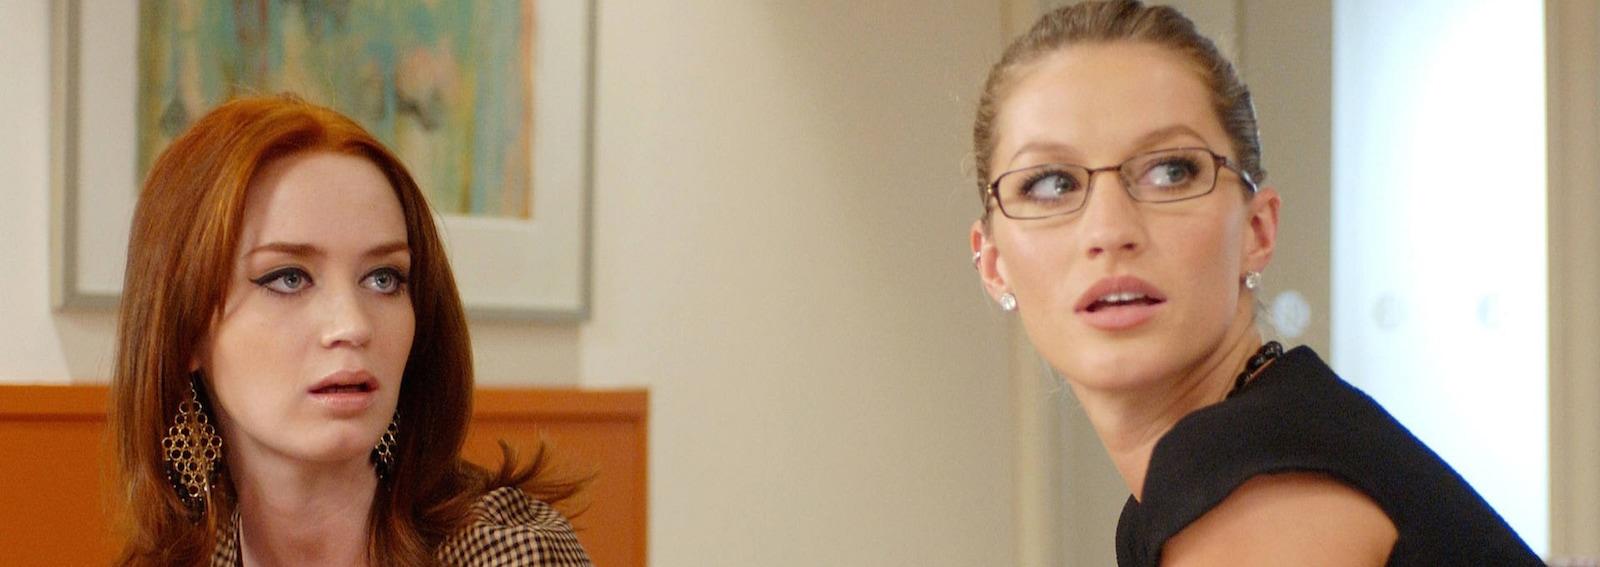 Gisele Bundchen occhiali